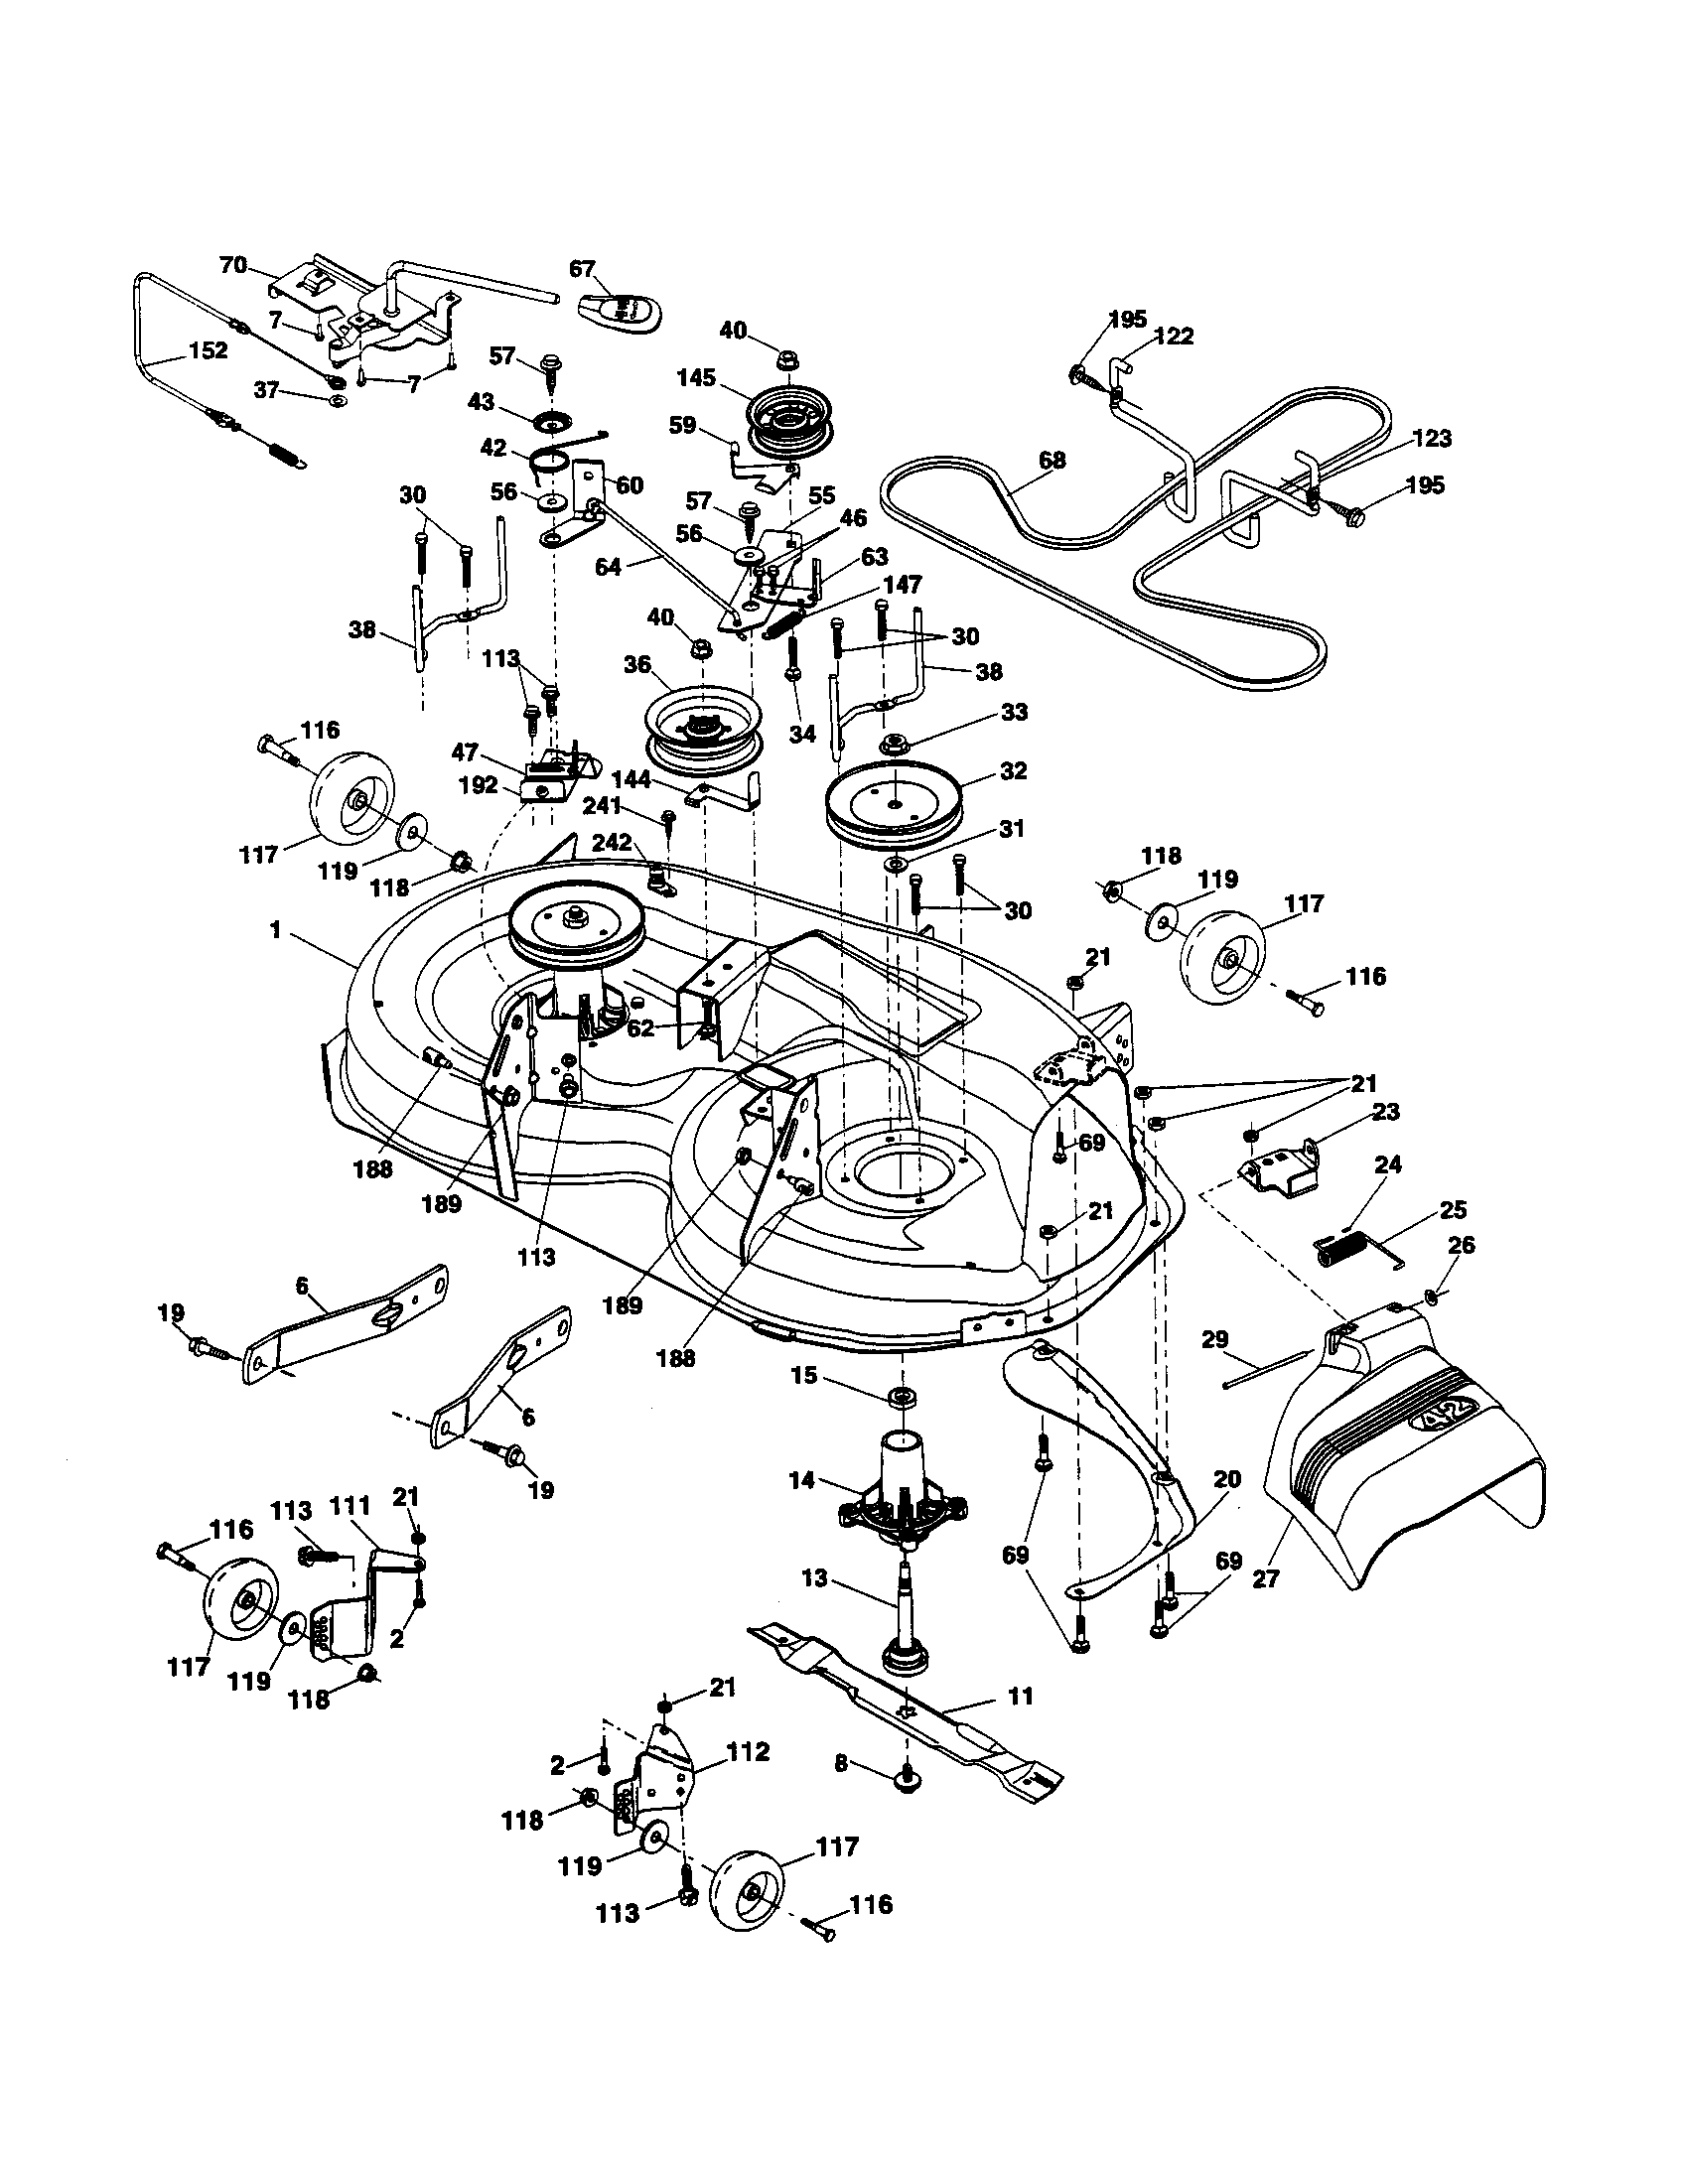 Ariens model 96046001100 lawn, tractor genuine parts